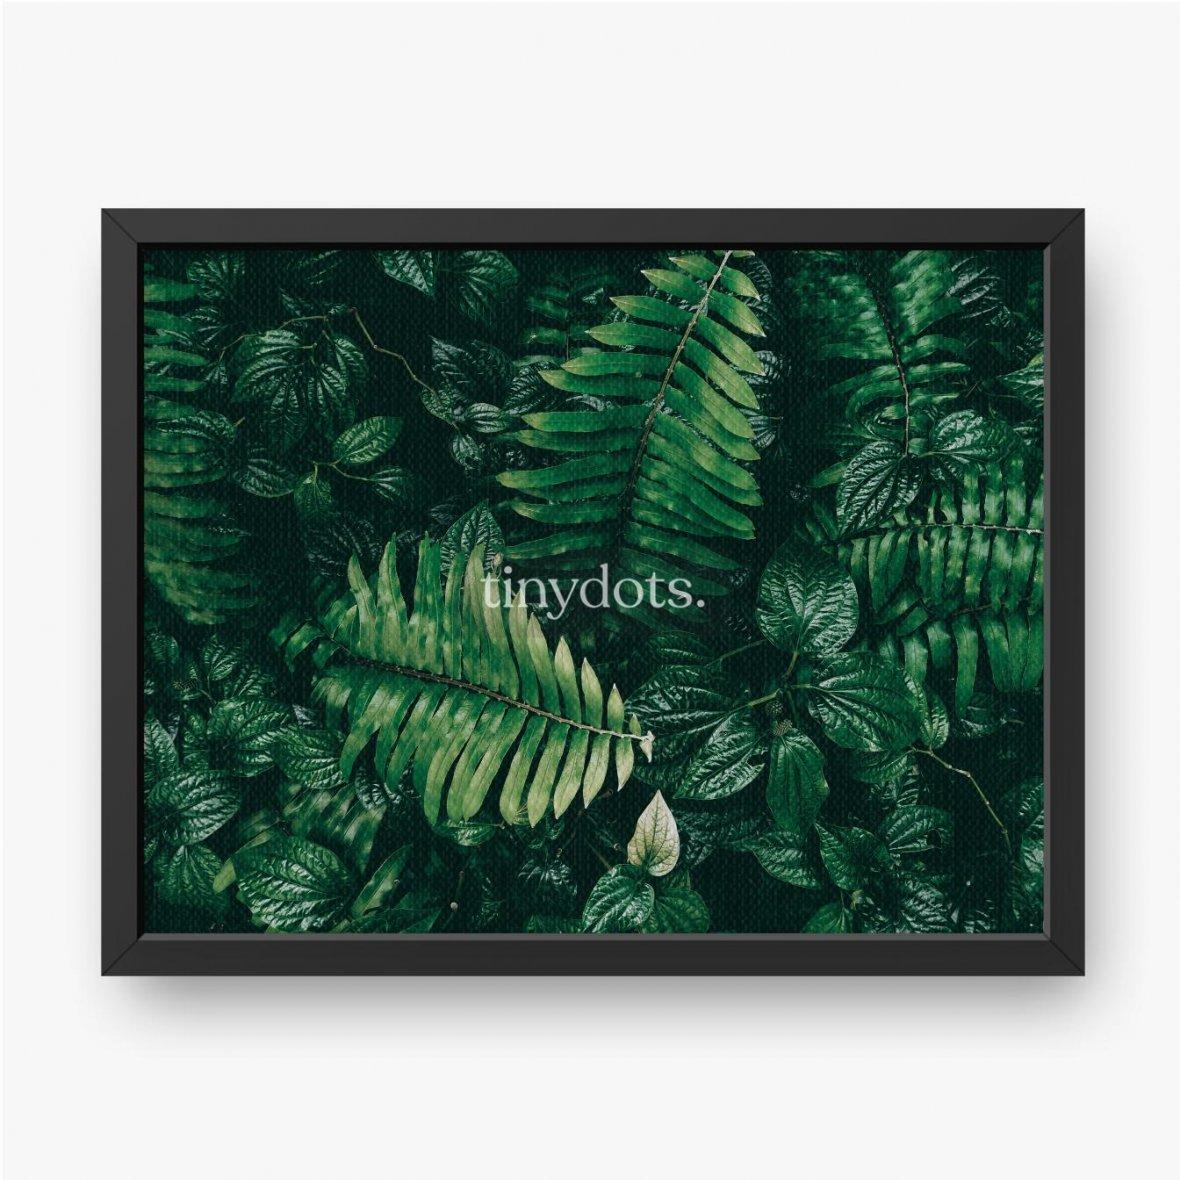 Gerahmte Leinwandbilder Tropisches grünes Blatt im dunklen Ton.